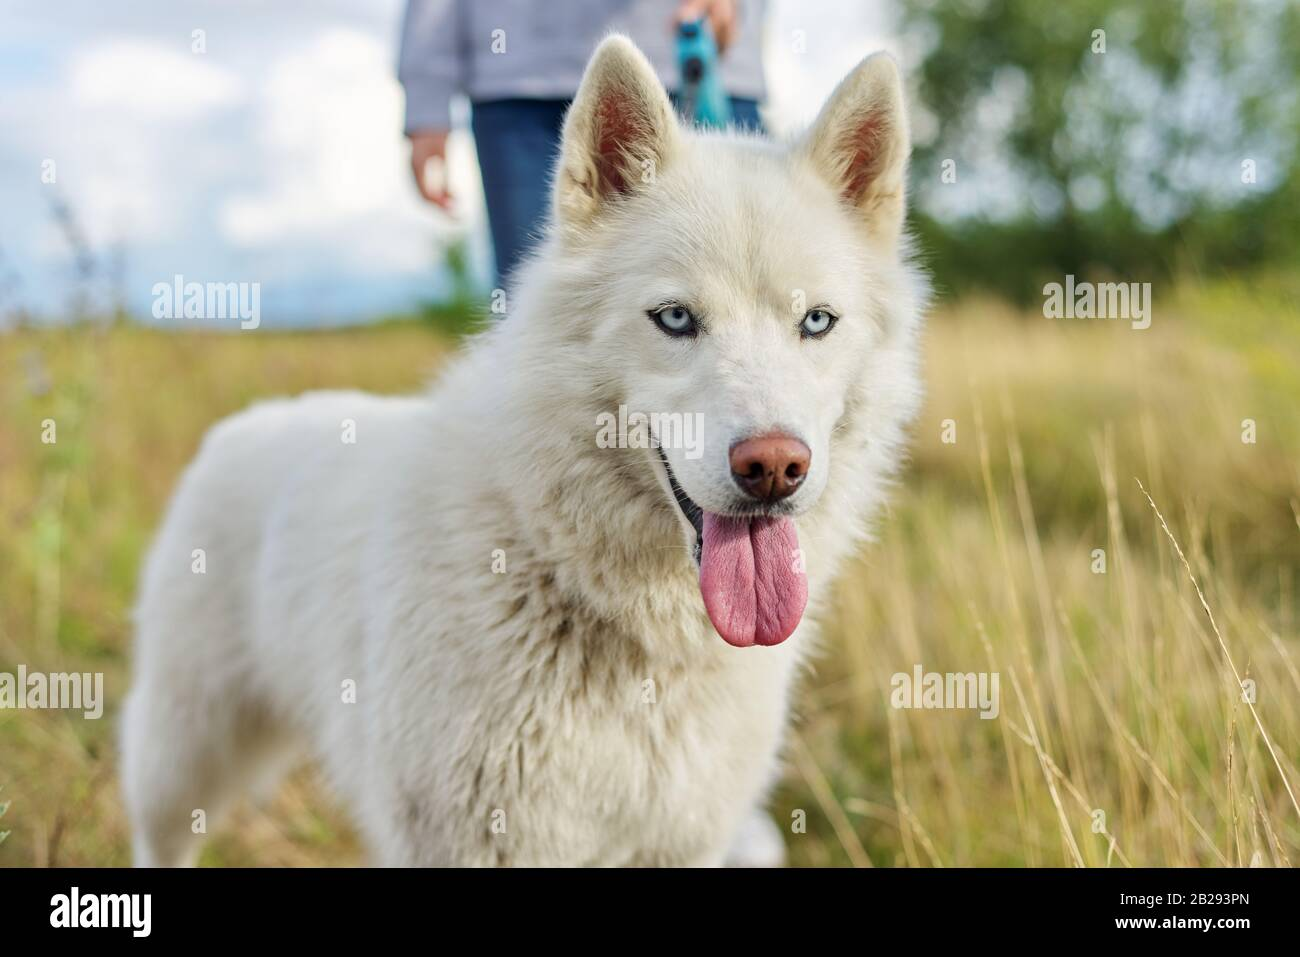 Closeup Young White Female Husky Dog With Tongue Blue Eyes On Walk Stock Photo Alamy